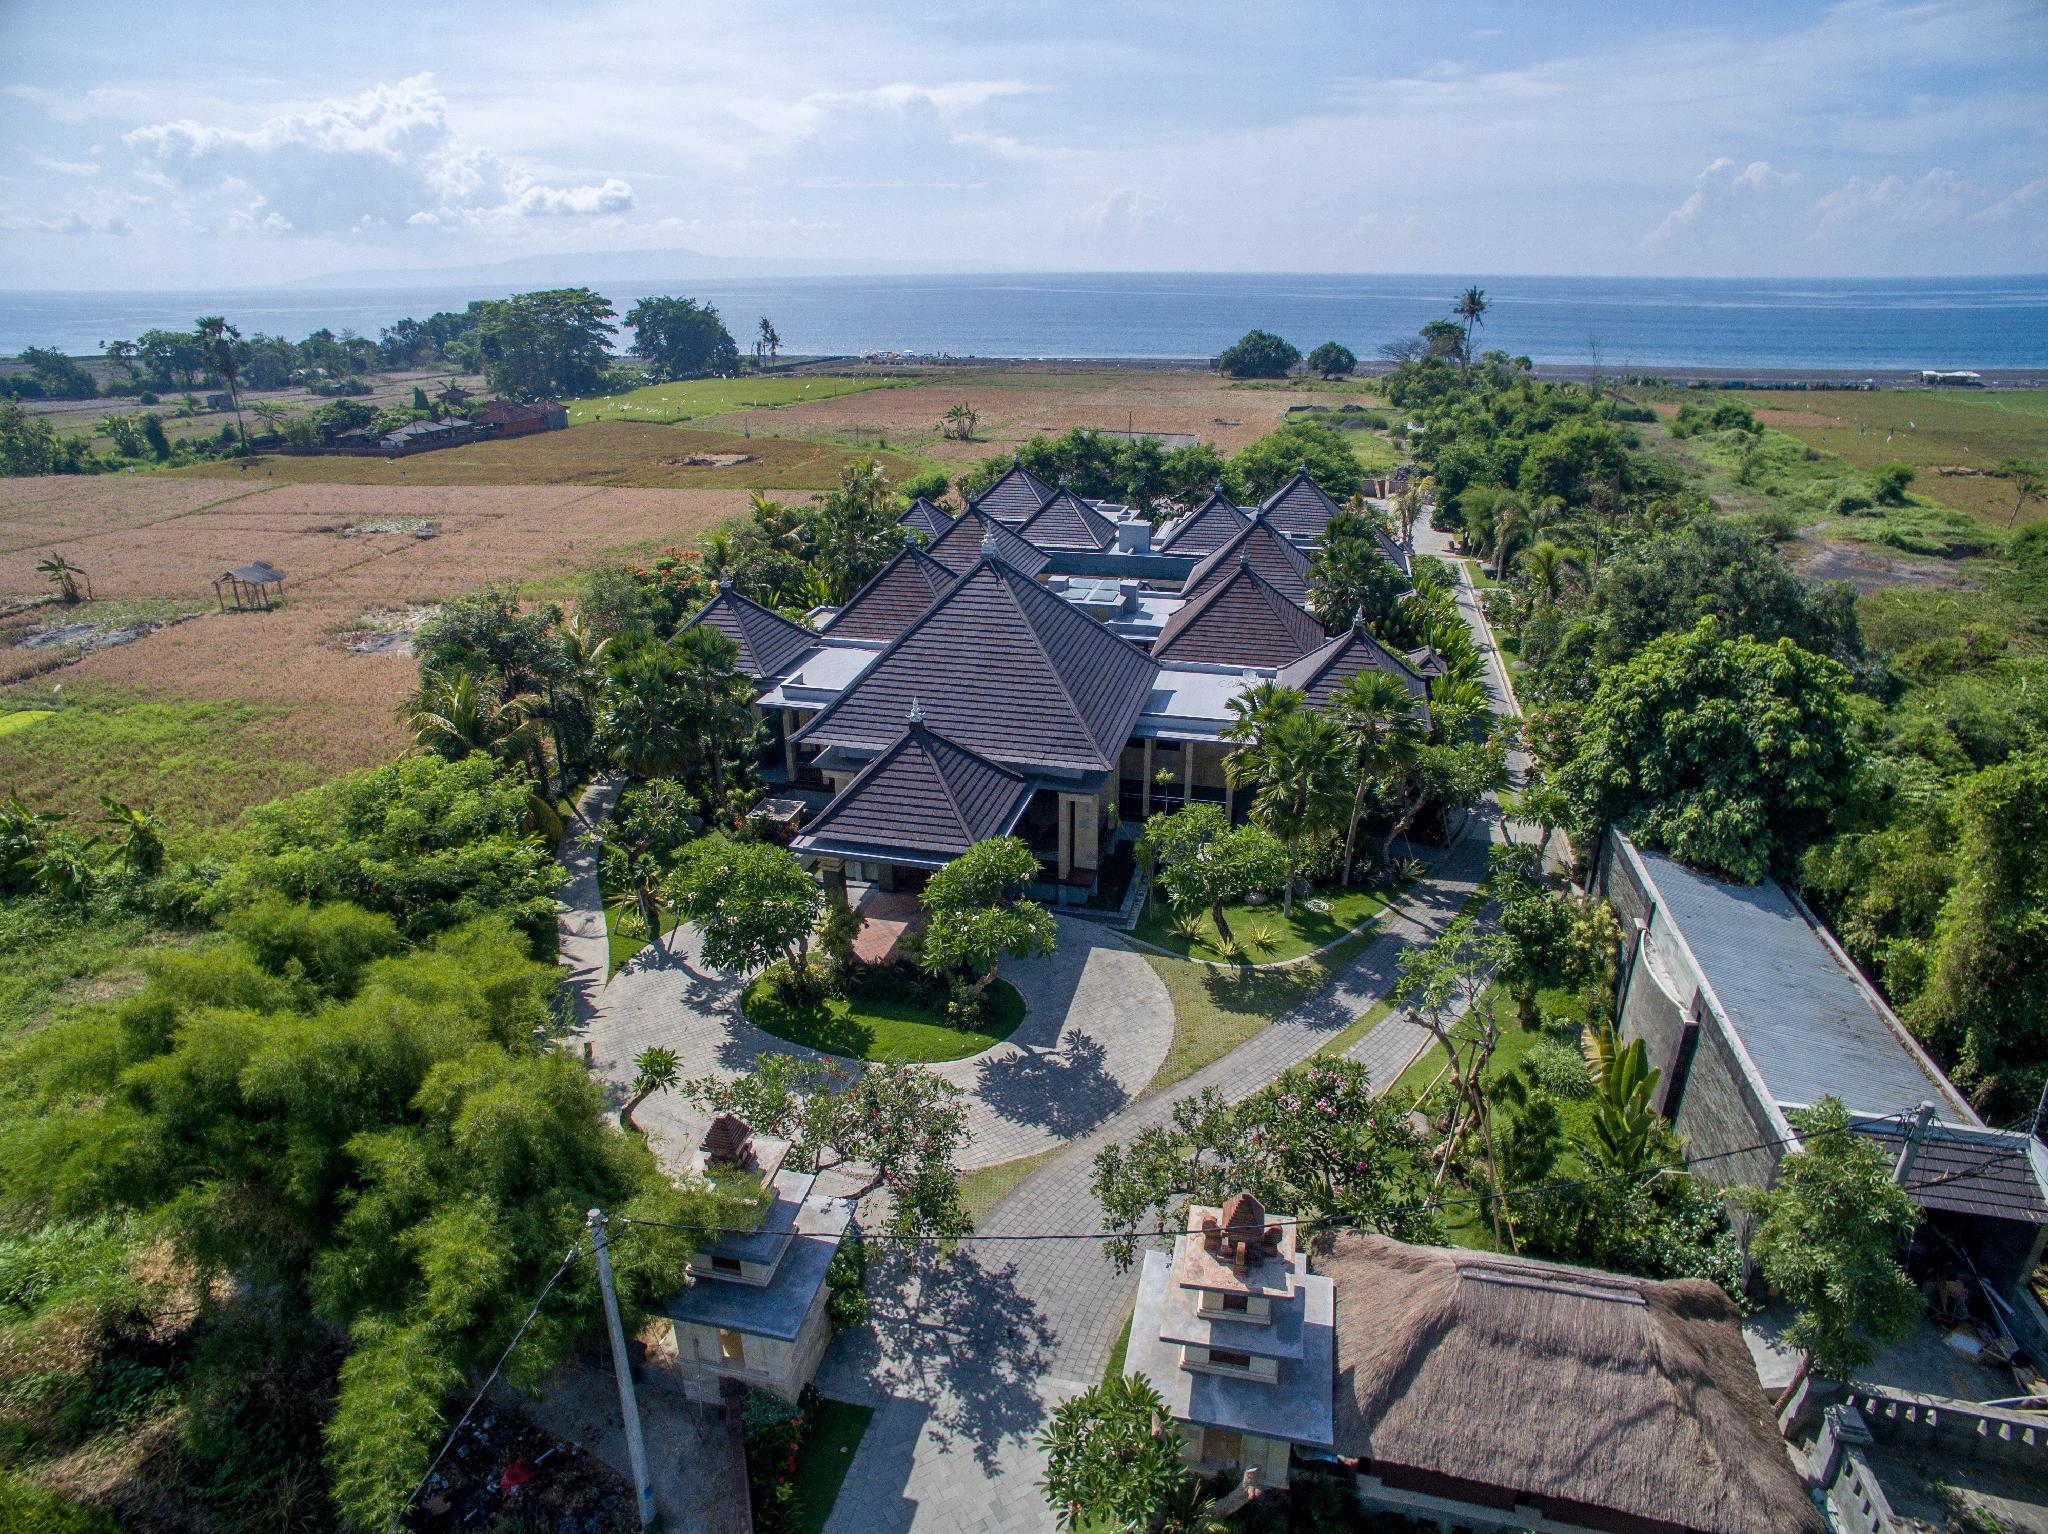 New Horizon Rice Fields And Beach Villas In Bali